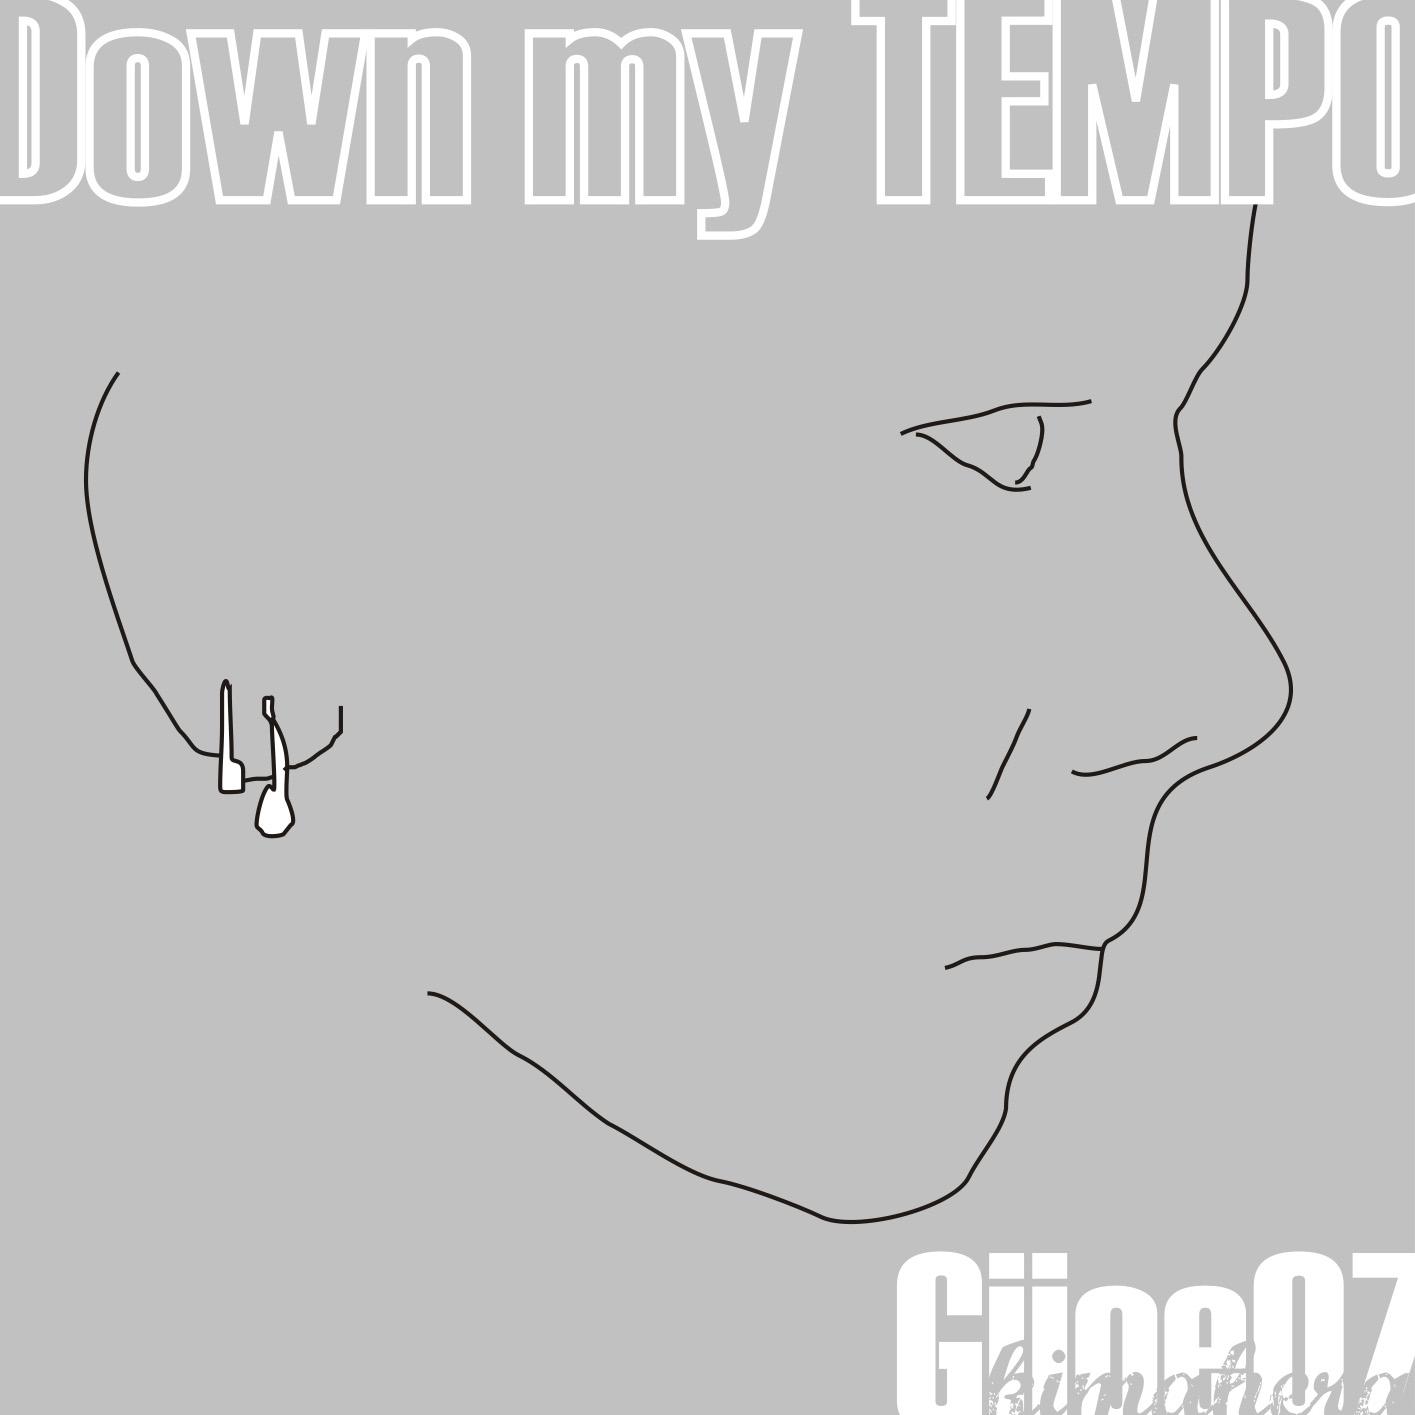 Gijoe - Down my tempo